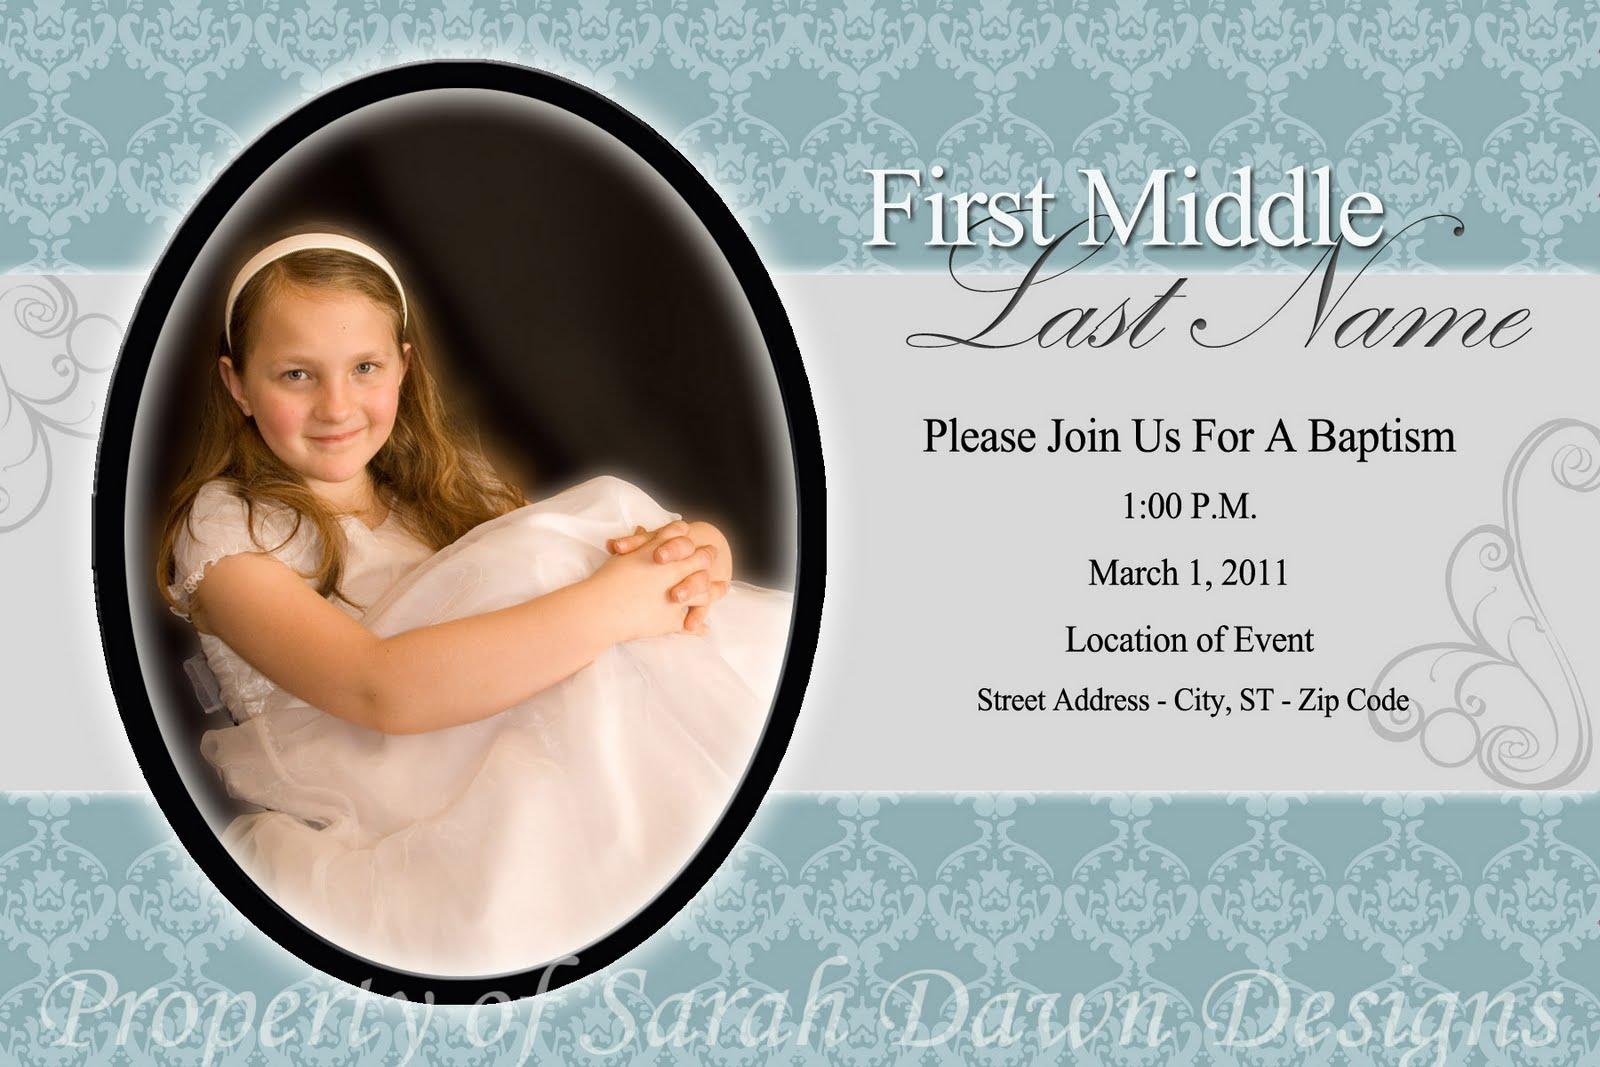 Photo Baptism Invitations (Sneak Peek)